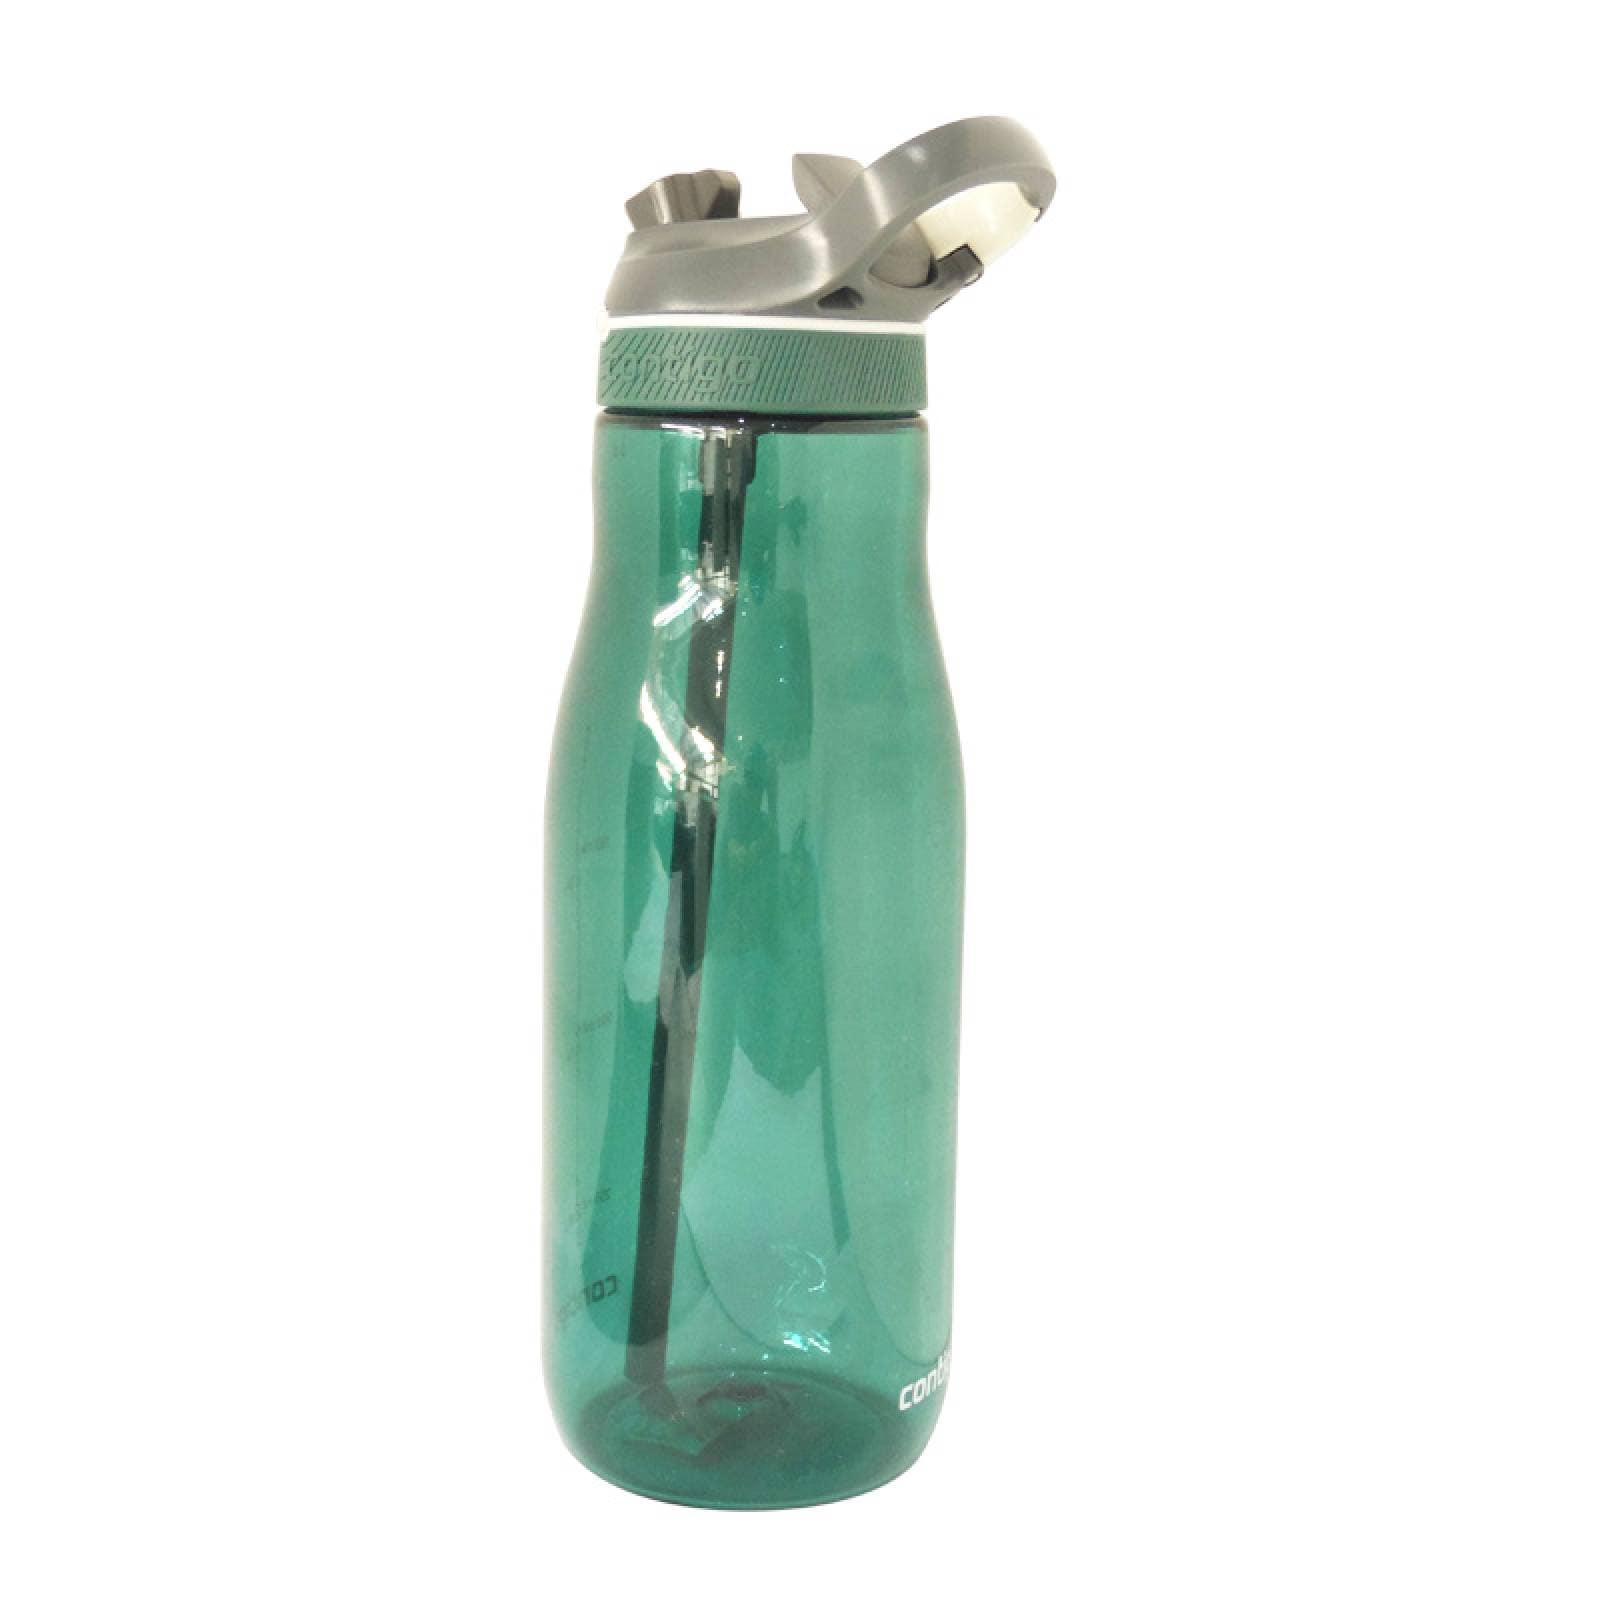 Botella Plastica Para Agua 40 Oz Autospout Ashland Acelga Contigo